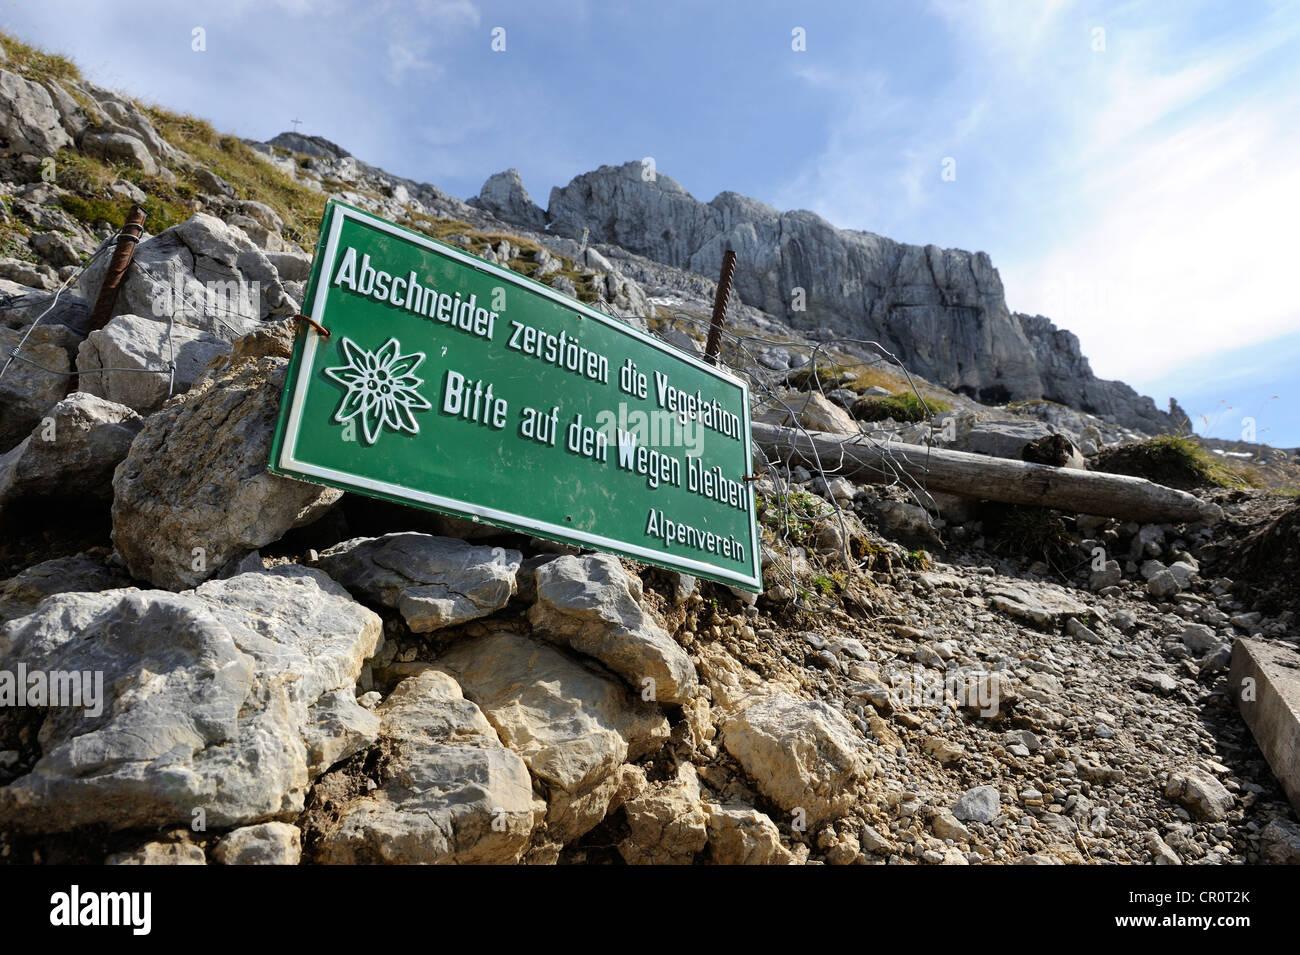 Sign 'Abschneider zerstoeren die Vegetation', German for 'cutters destroy the vegetation', Karwendel - Stock Image